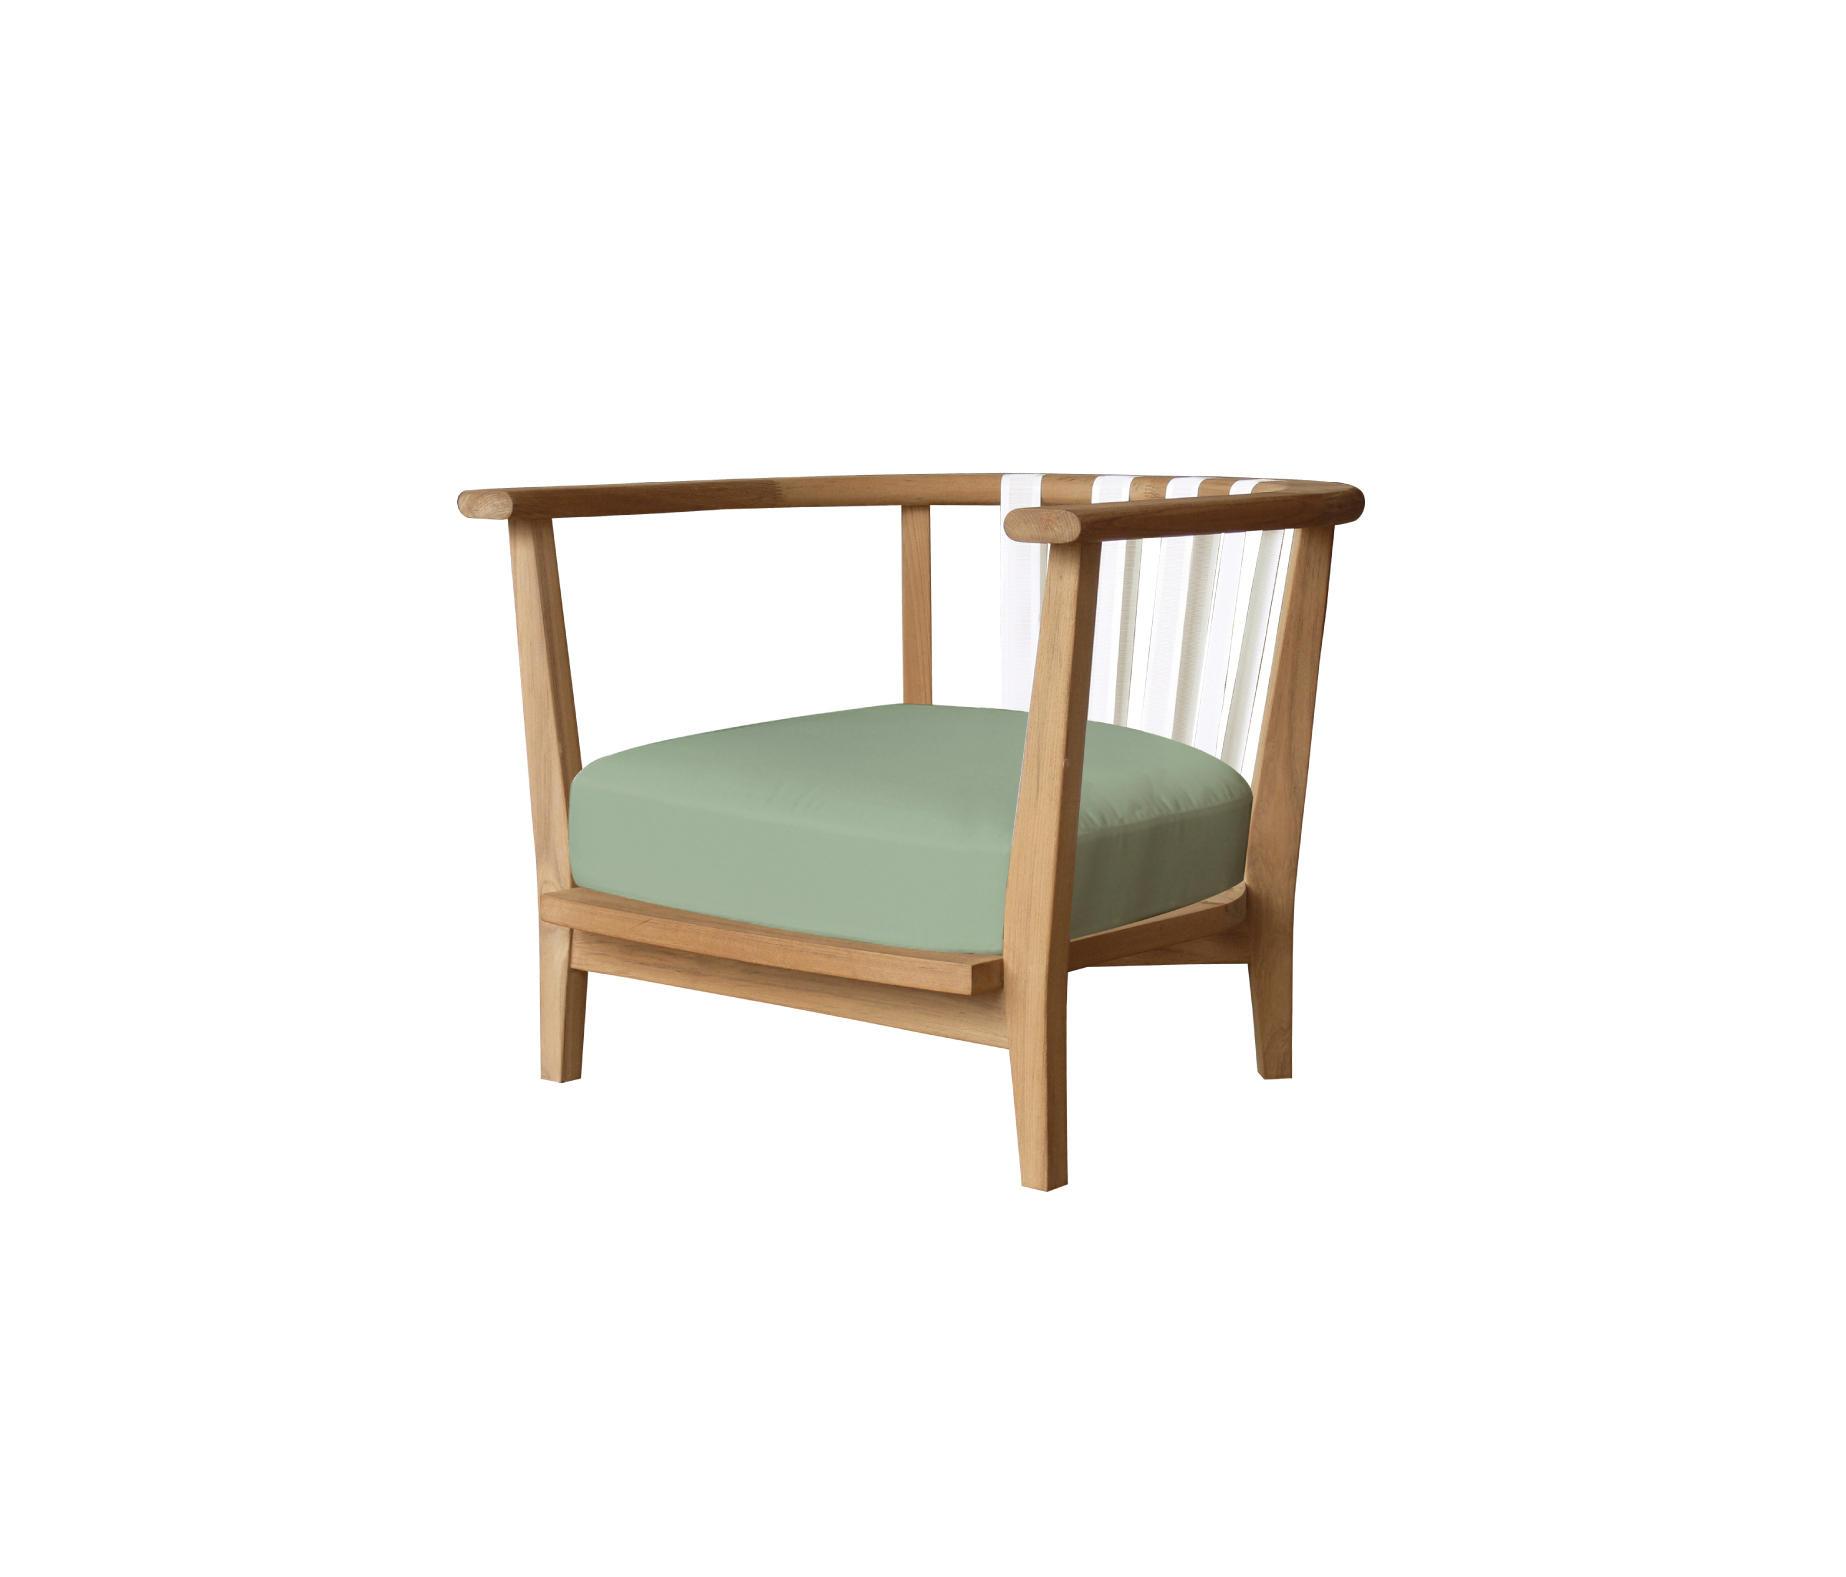 Tiera Outdoor Lounge Chair Sessel Von Deesawat Architonic